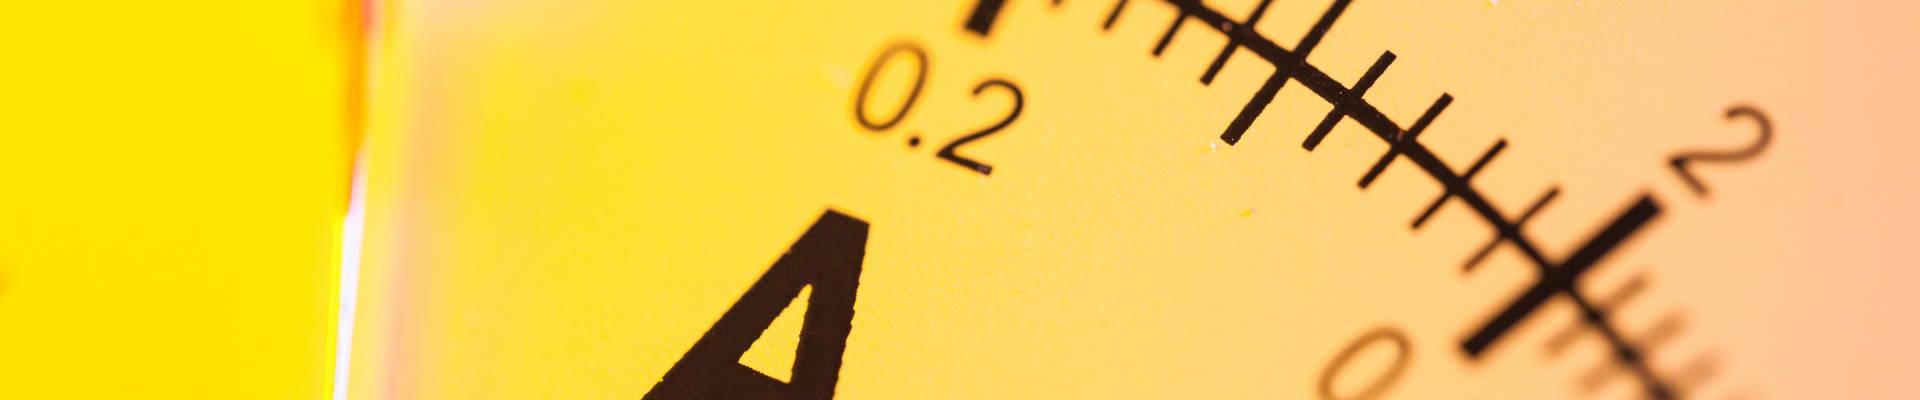 DIY galvanometer Home Science Tools